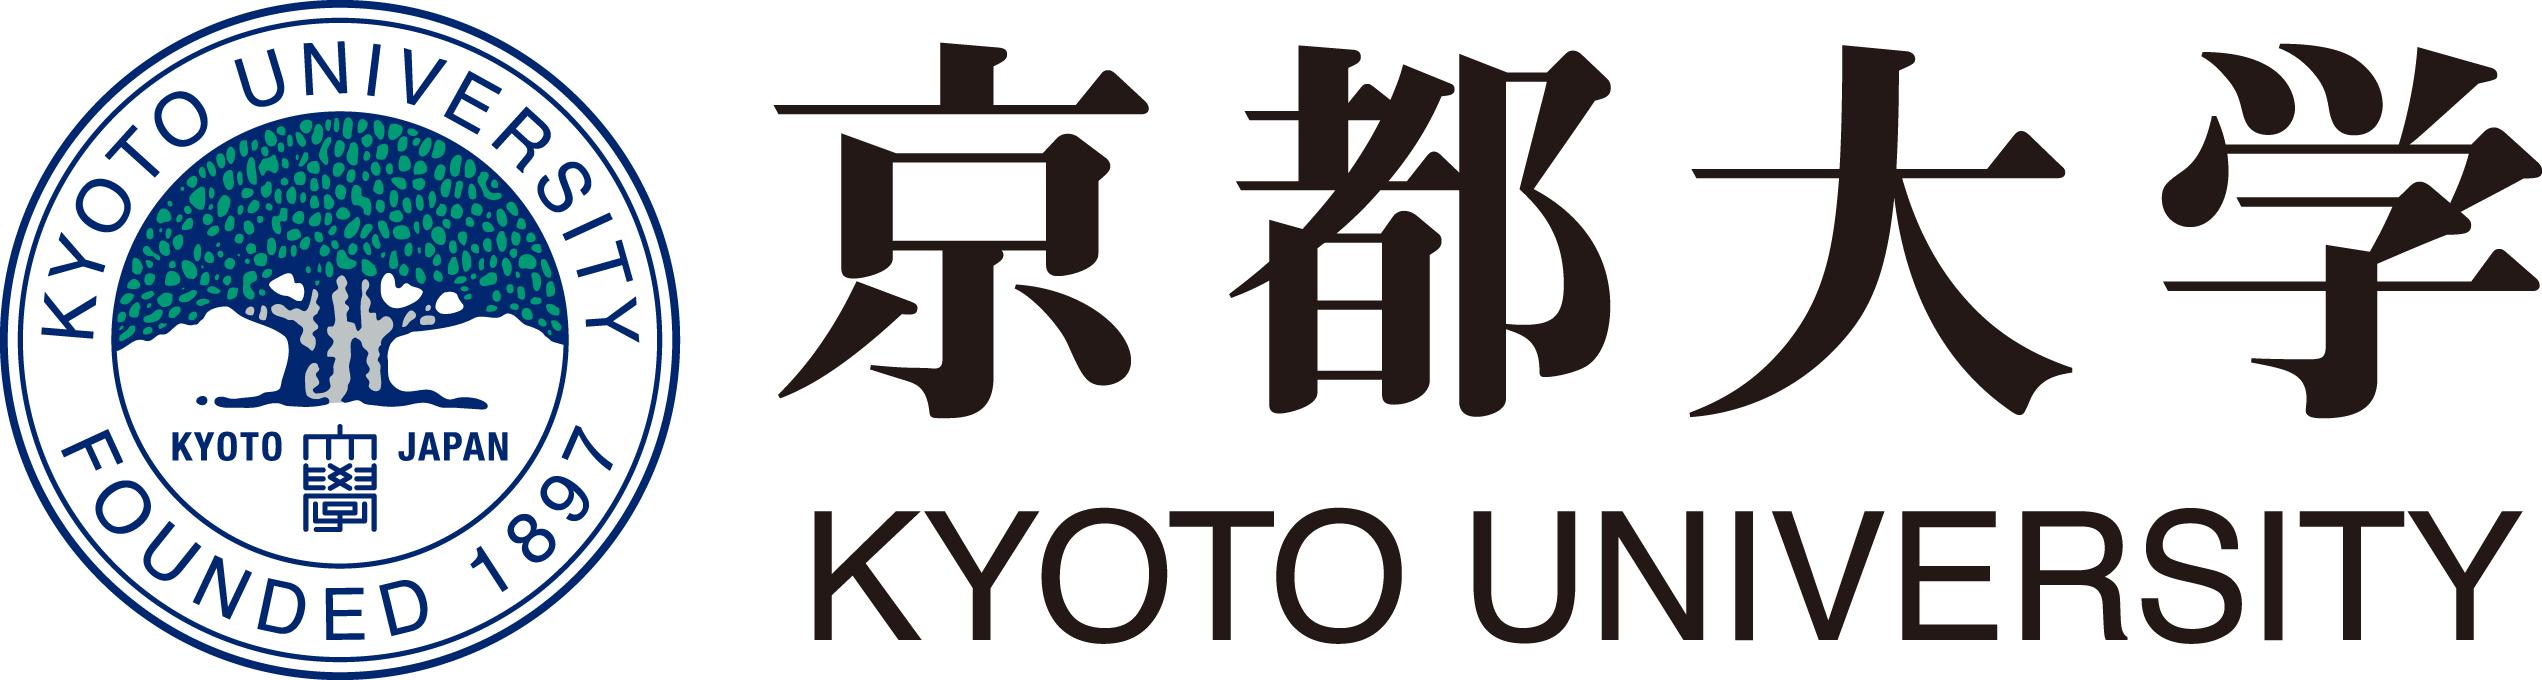 KYOTO-U_LOGO.JPG